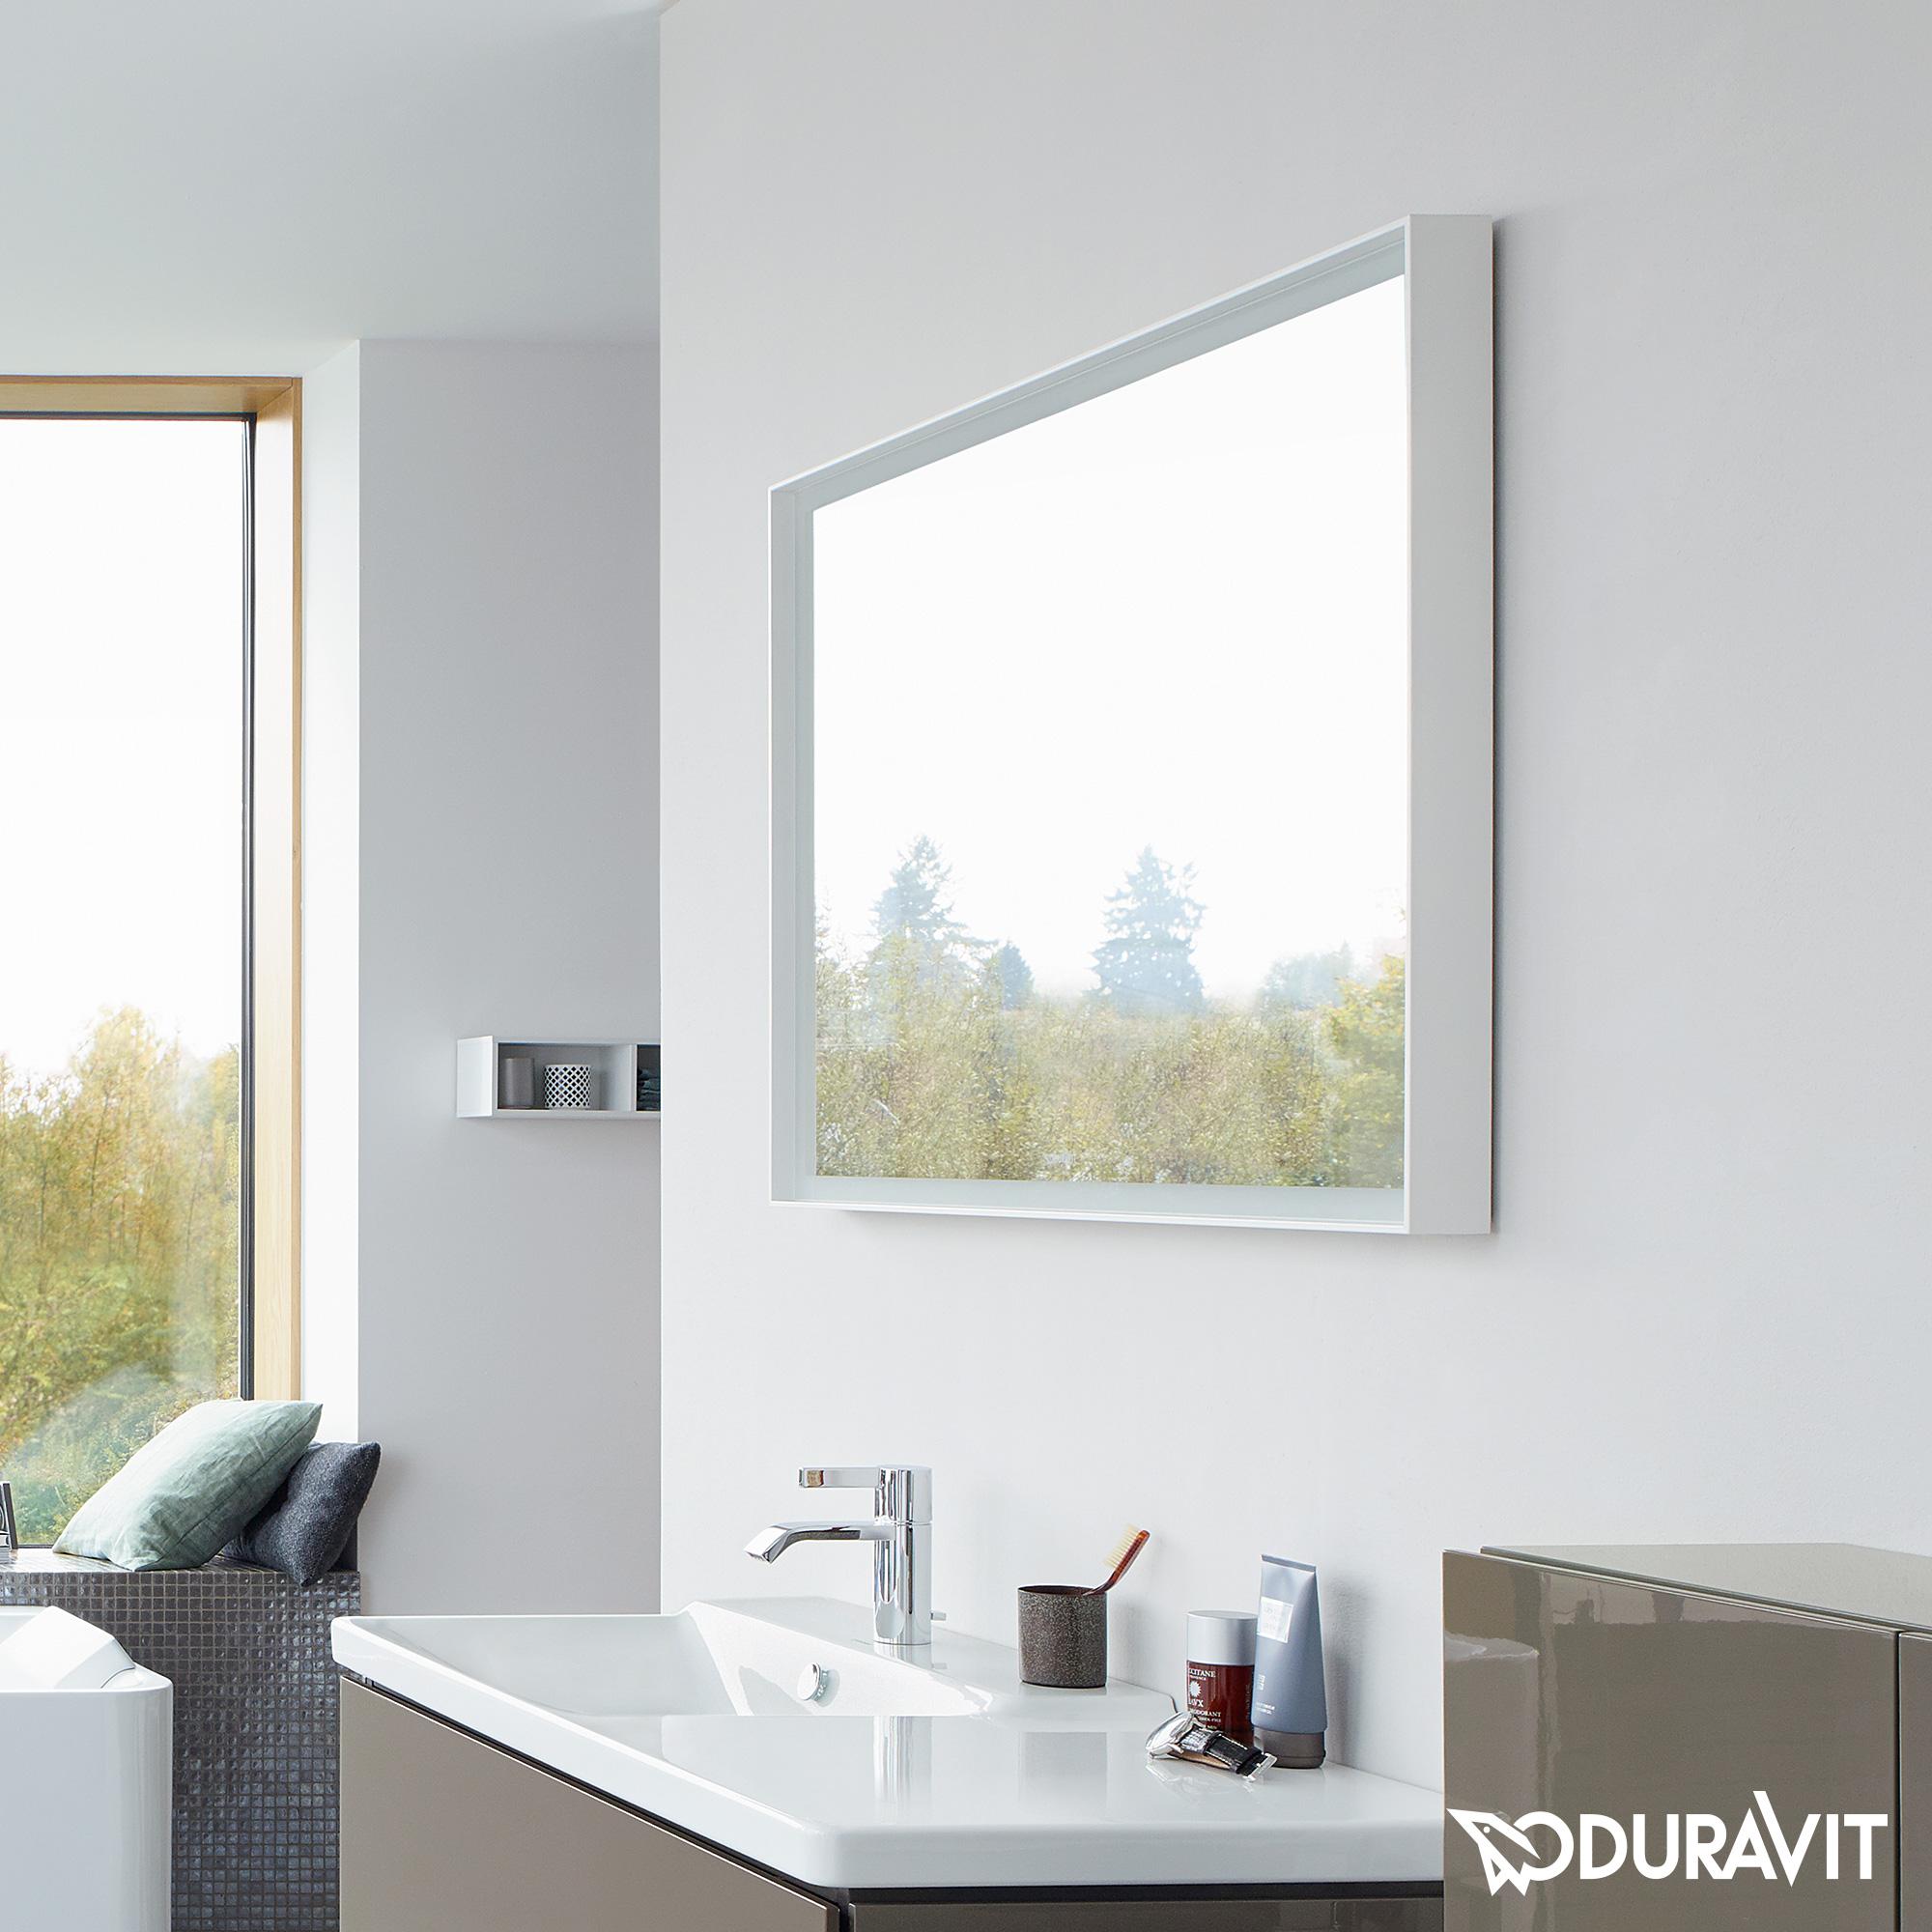 duravit l cube spiegel mit led beleuchtung lc738700000. Black Bedroom Furniture Sets. Home Design Ideas